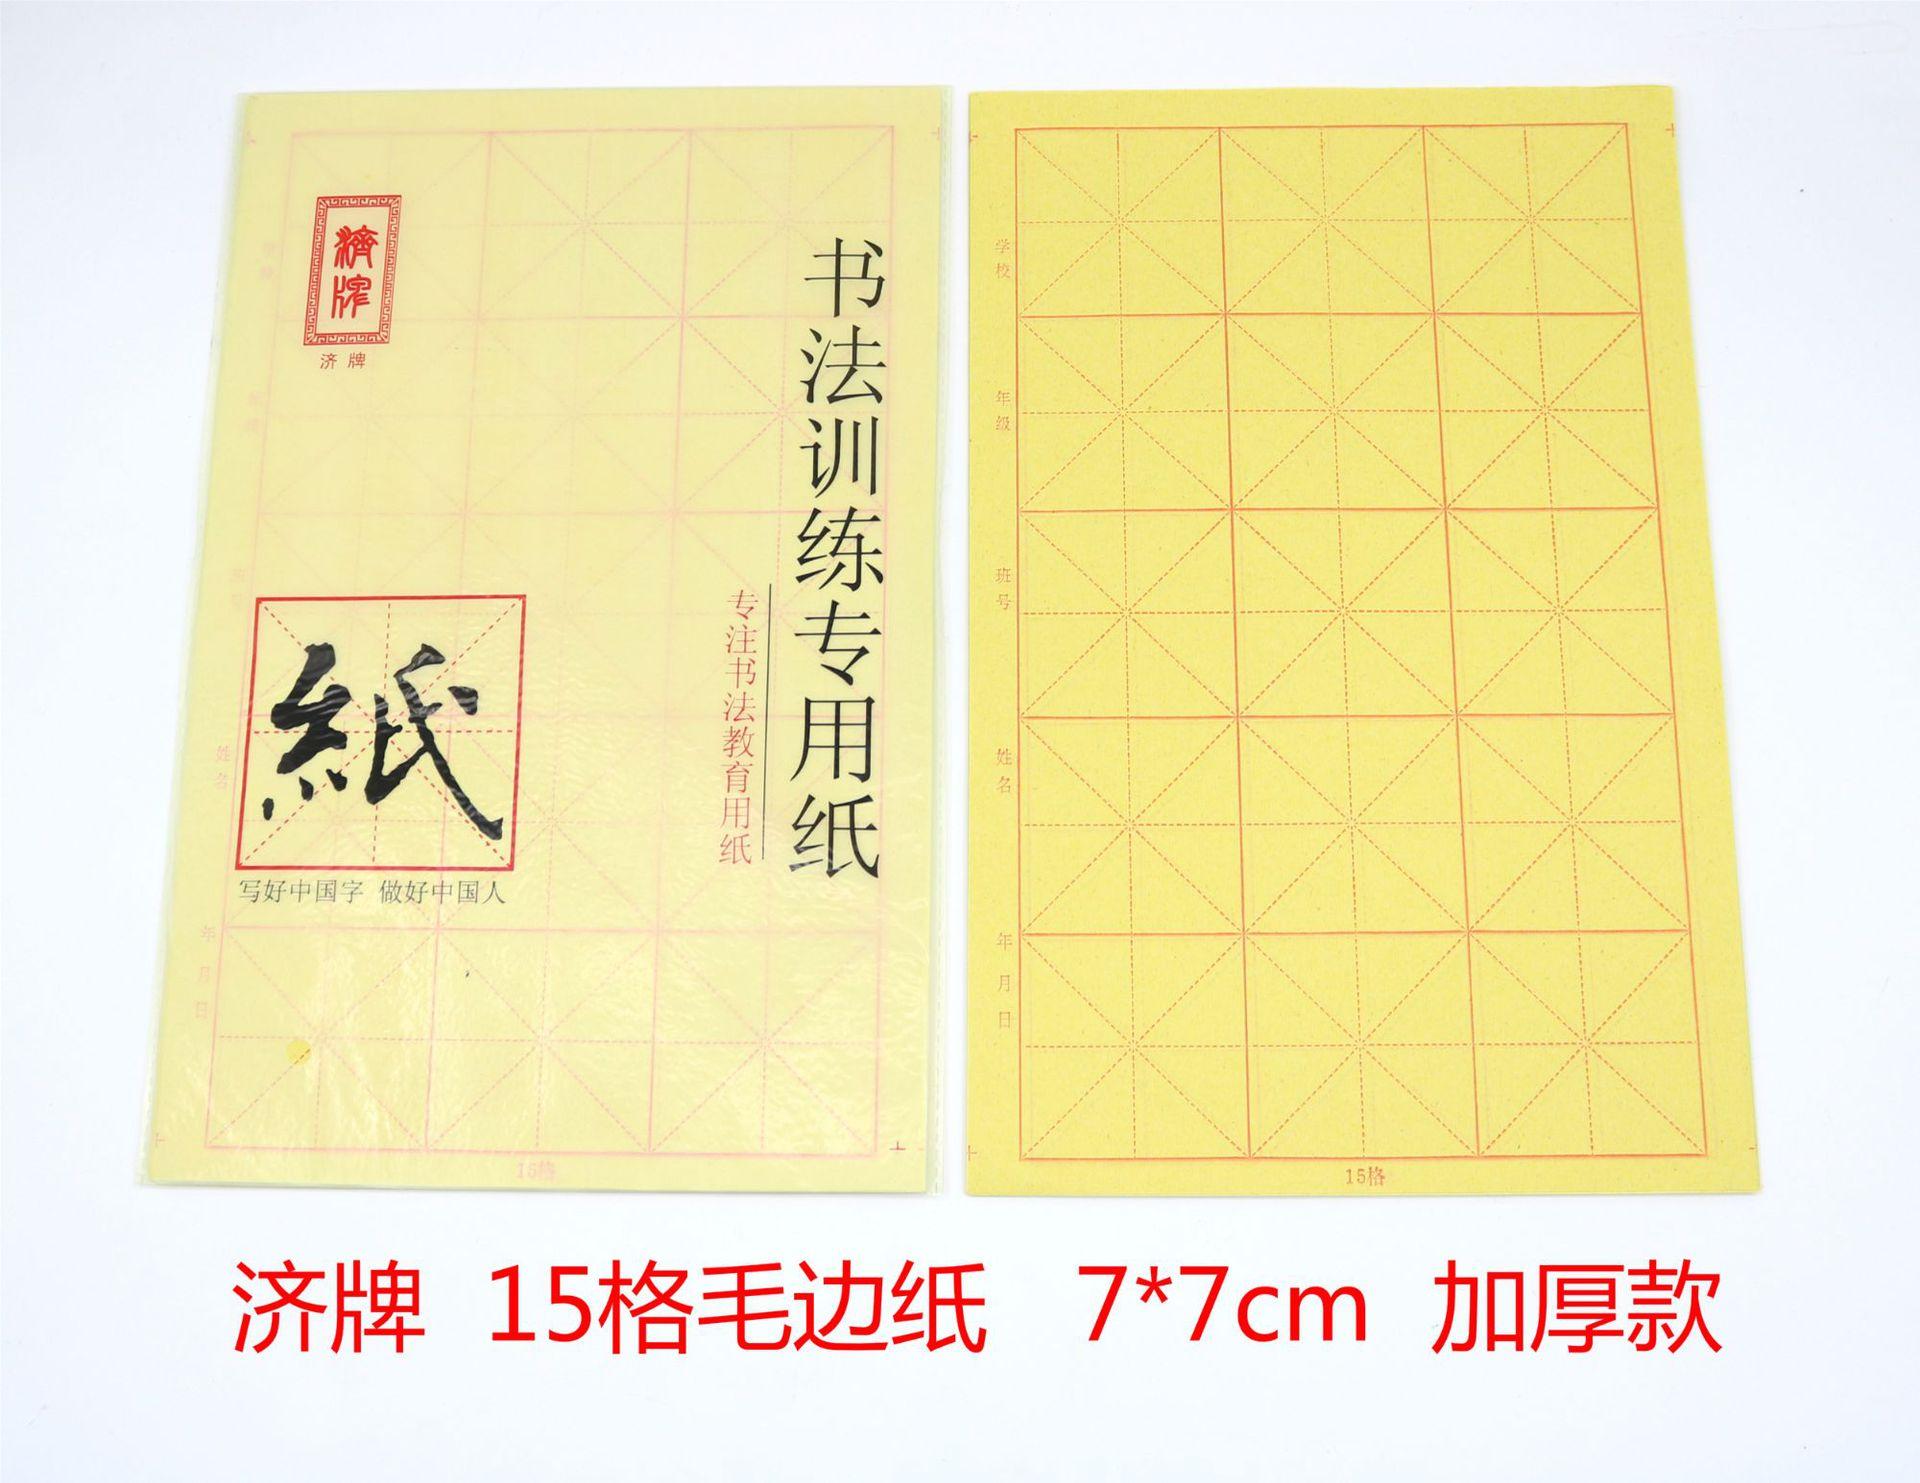 Fabricantes de papel de bambú de 15 entramado de venta directa 7*7 Cm de entrenamiento para práctica de caligrafía cooke